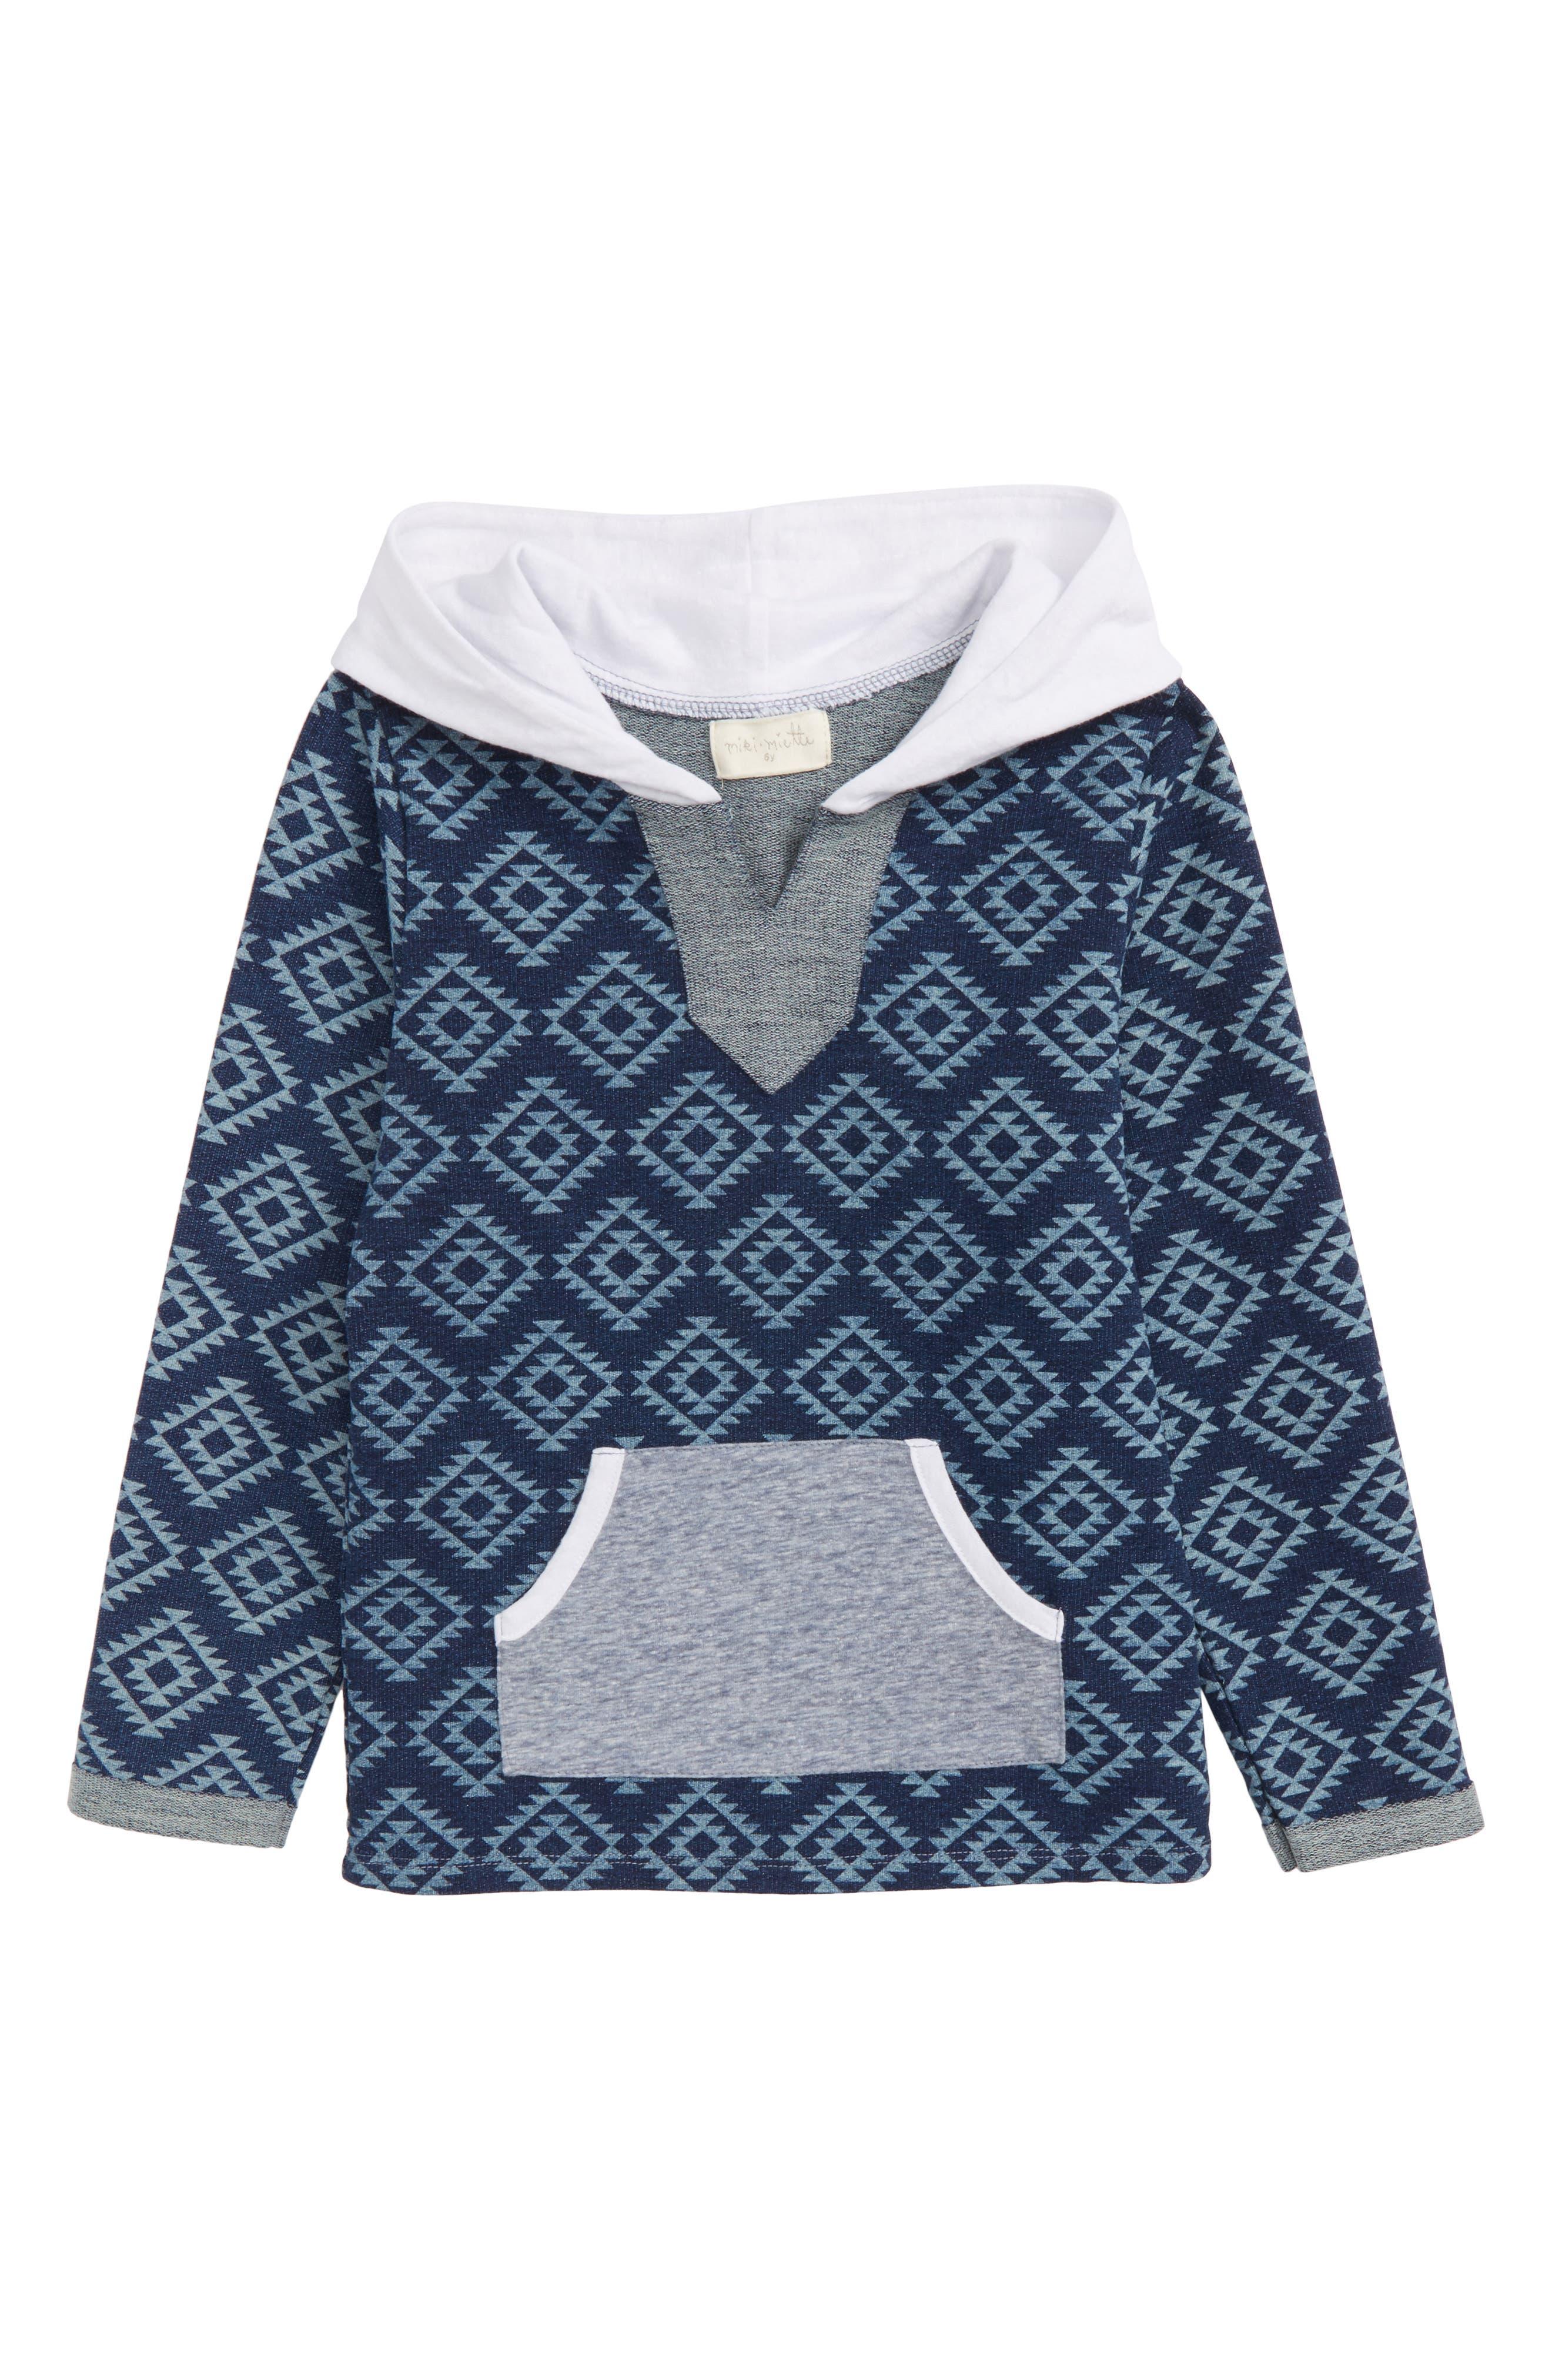 Alternate Image 1 Selected - Miki Miette Rico Sweatshirt (Toddler Boys, Little Boys & Big Boys)